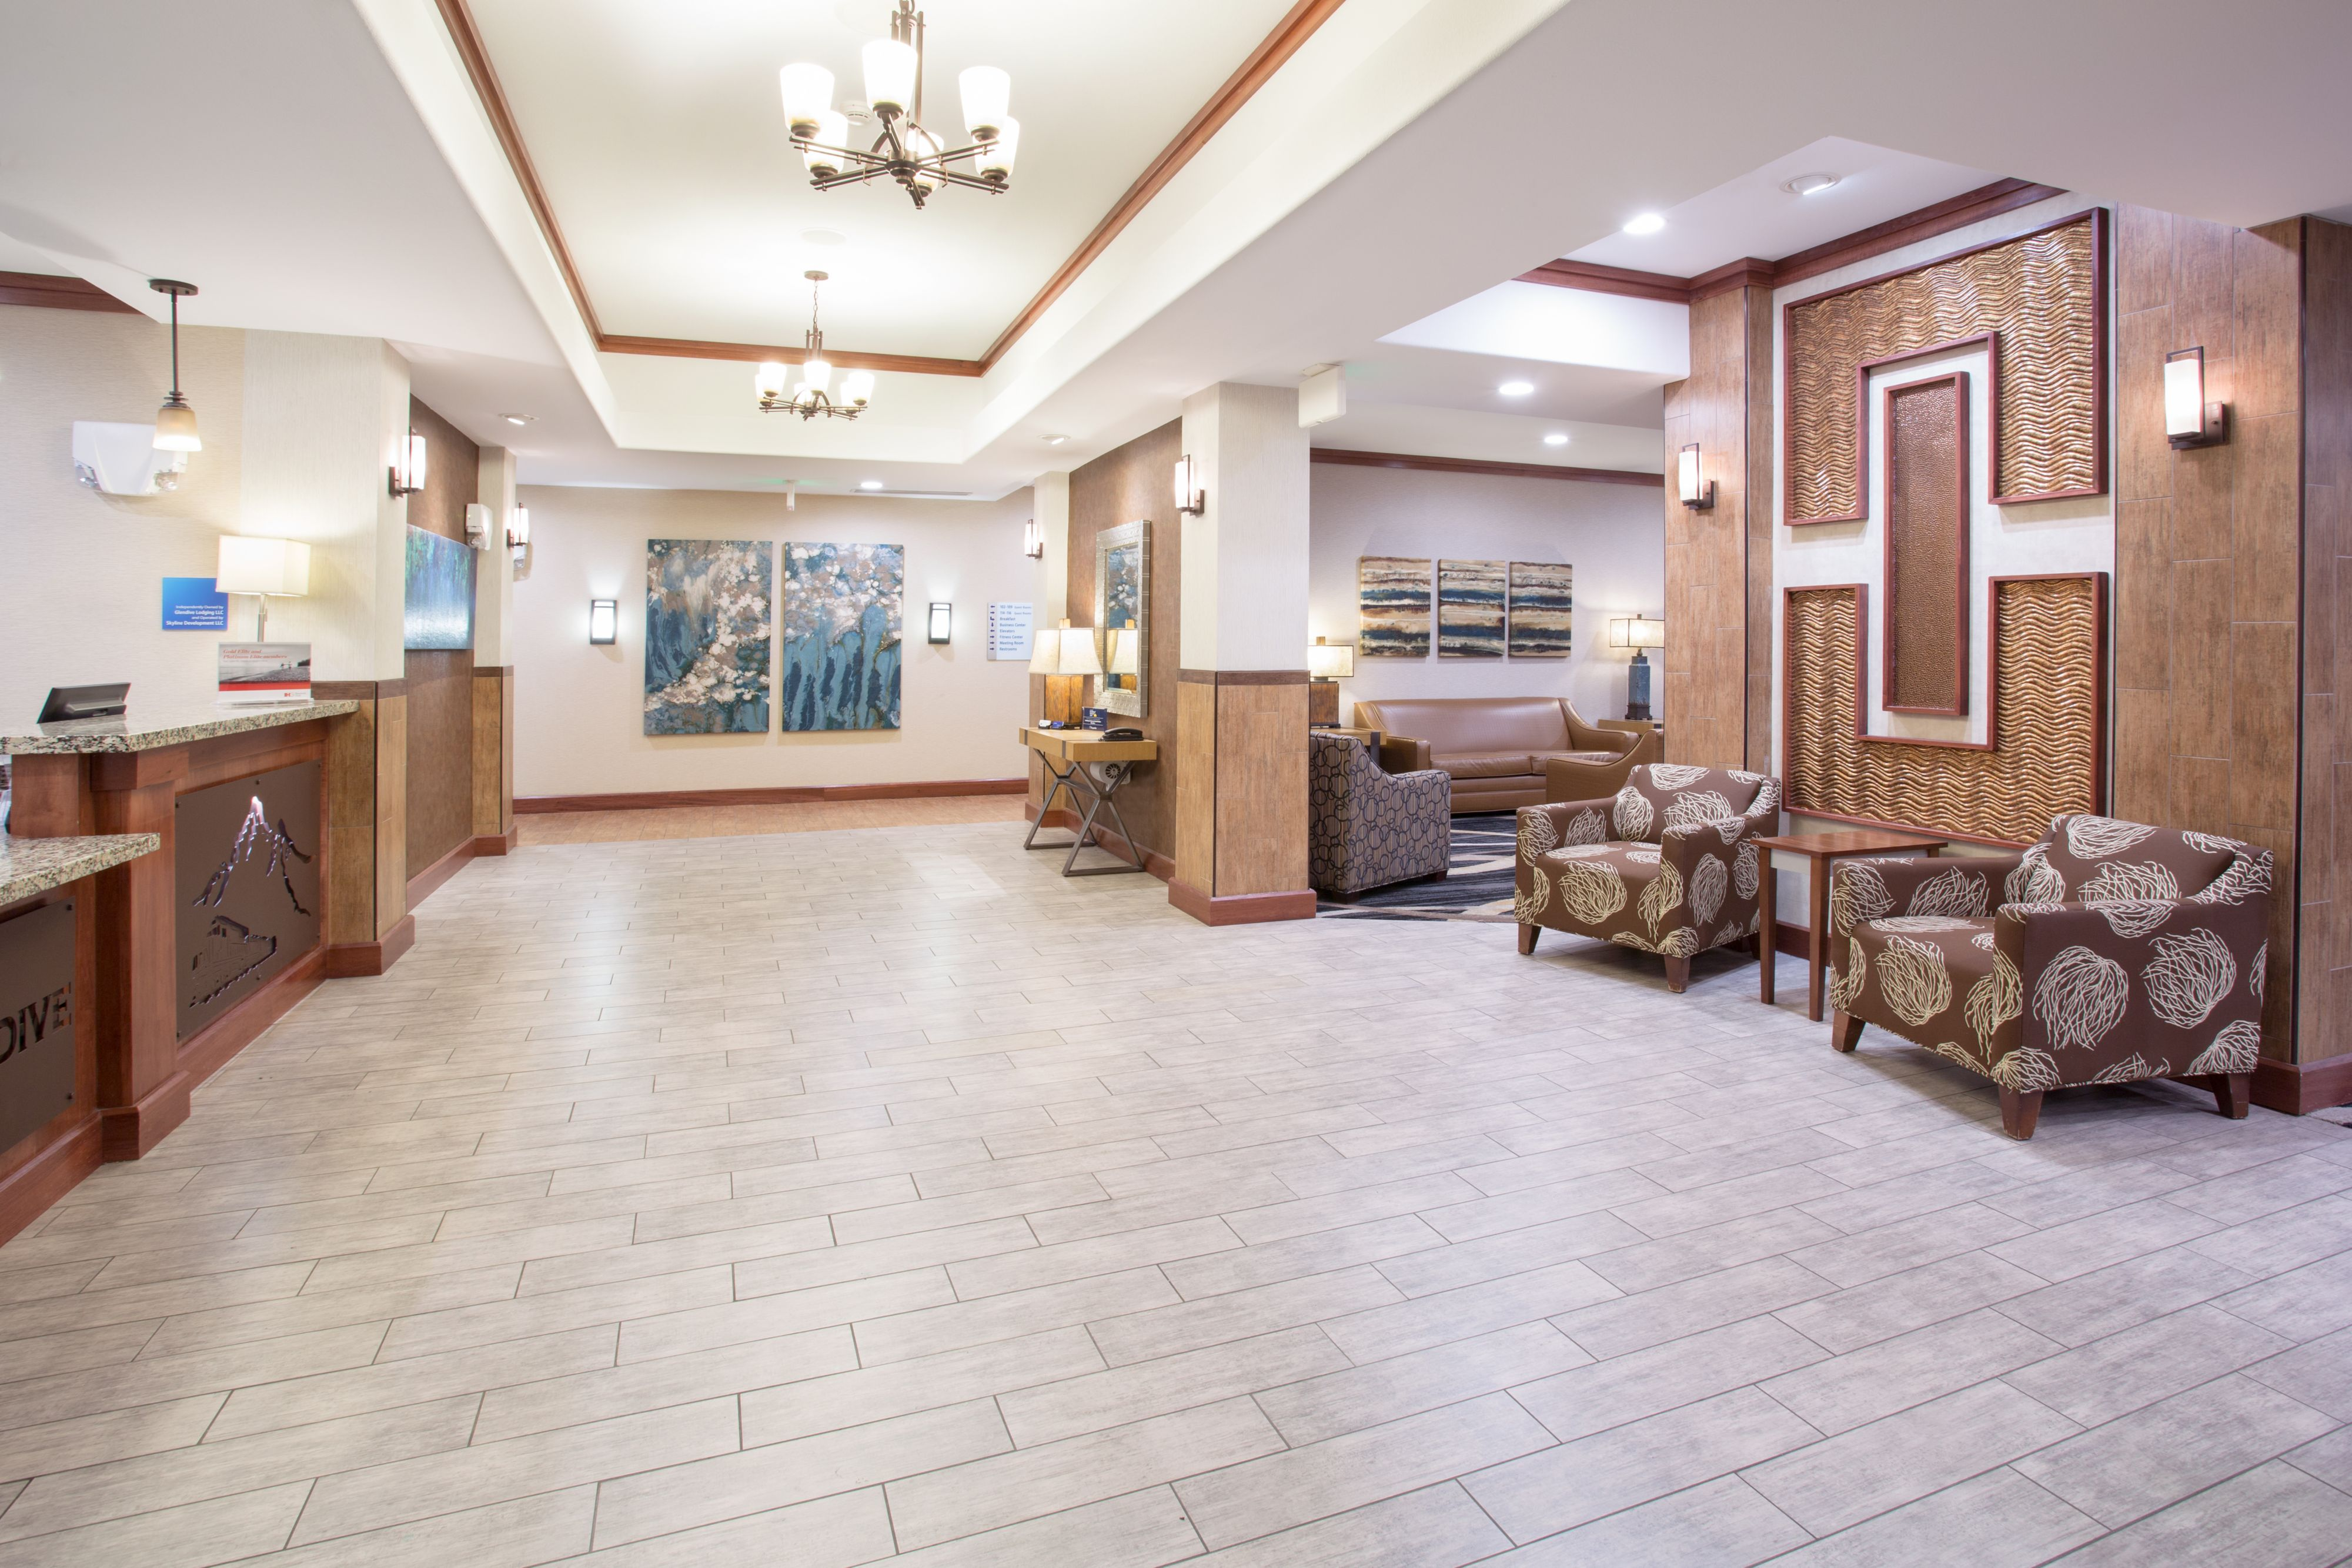 Holiday Inn Express & Suites Glendive image 4